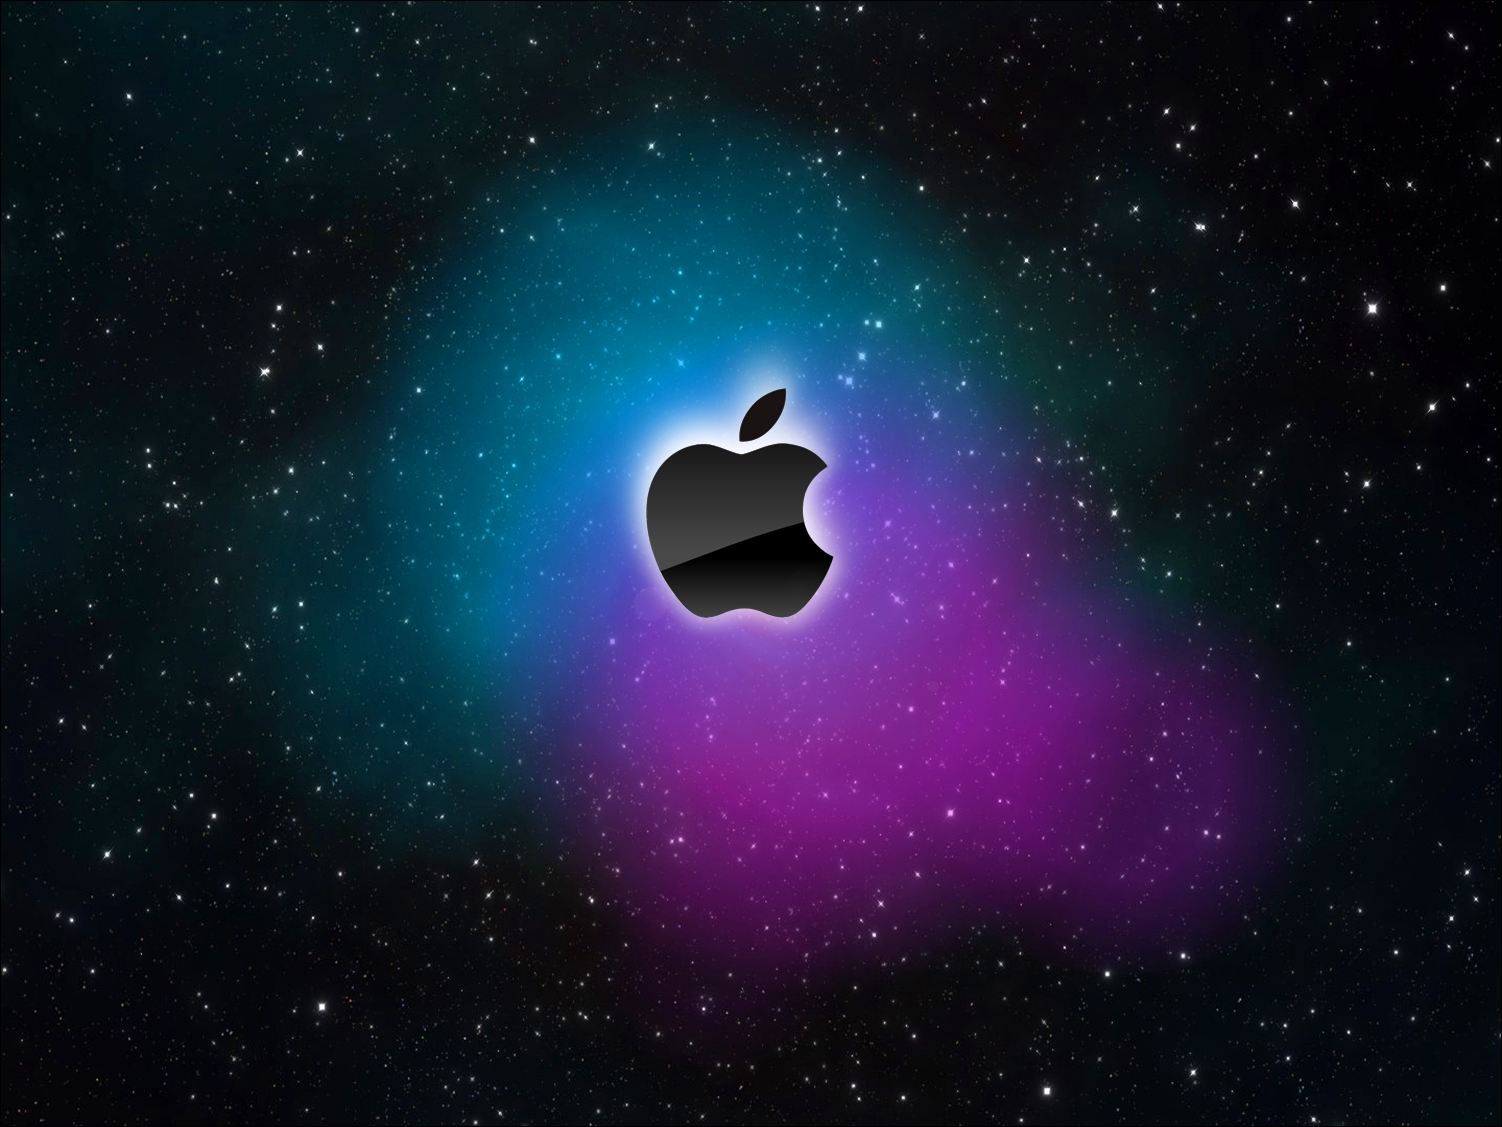 Apple Wallpapers Macbook Group (82+)